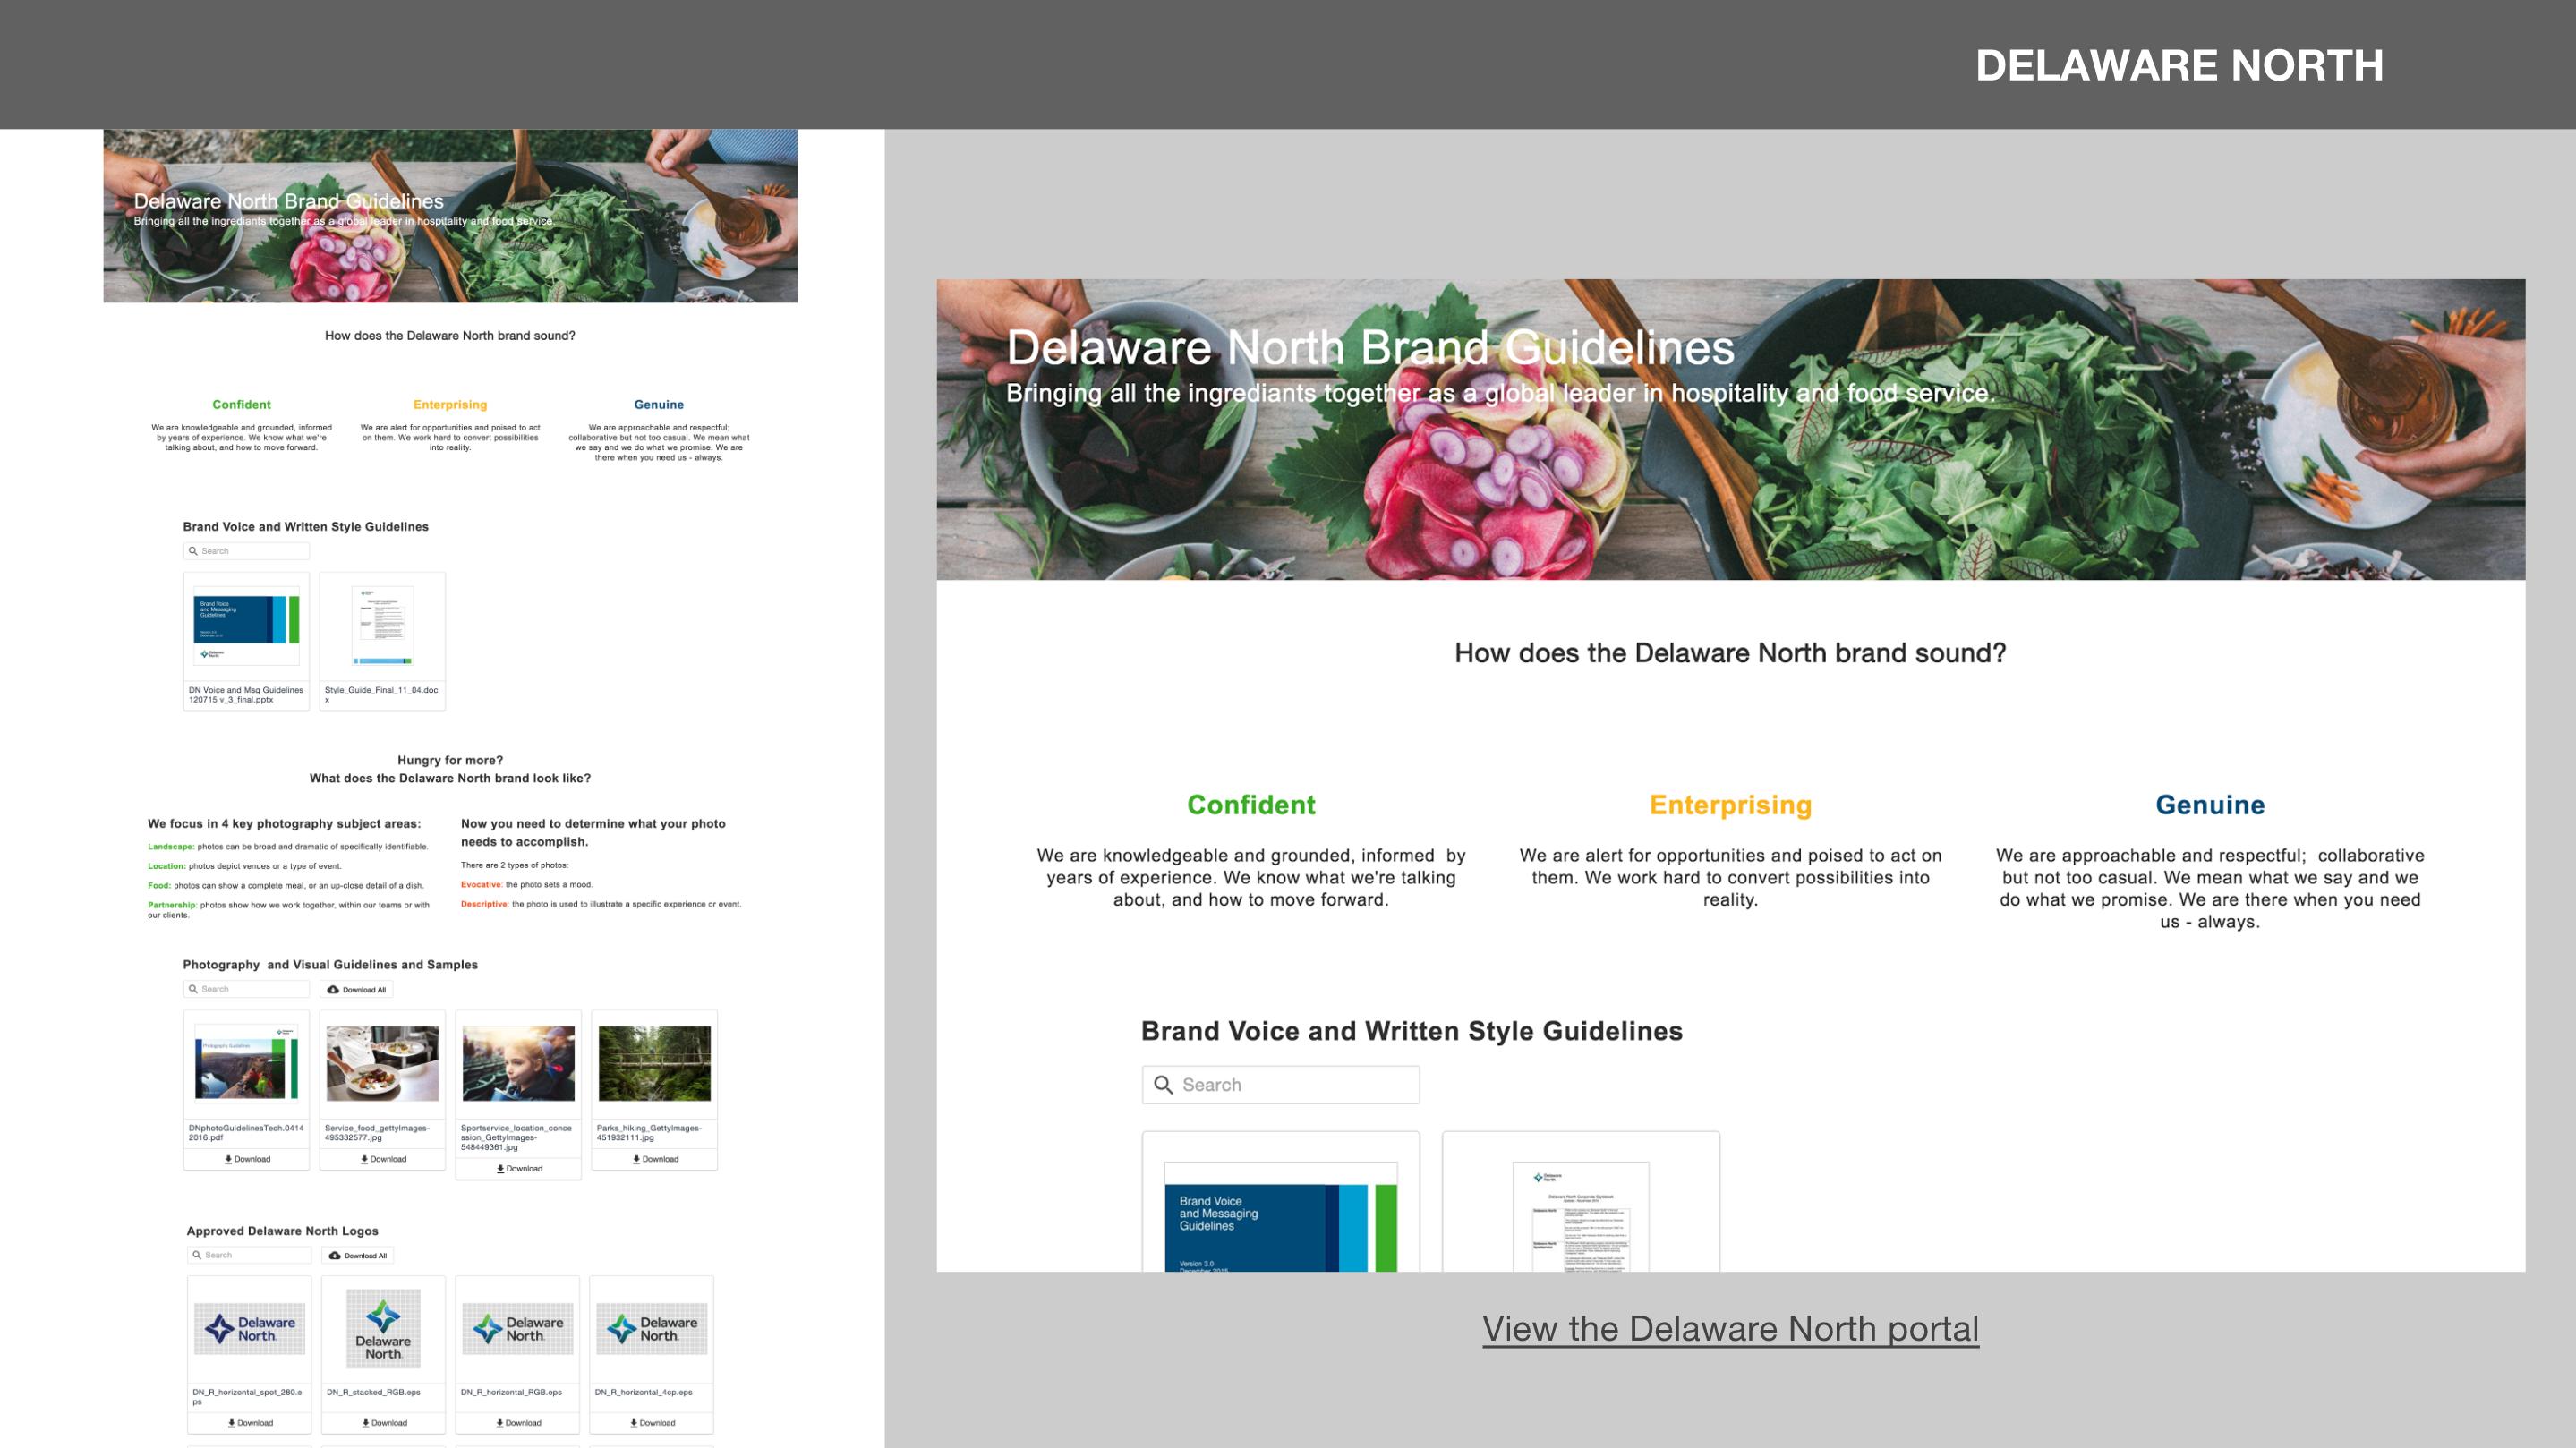 Delaware North Brand Portals & Content Curation